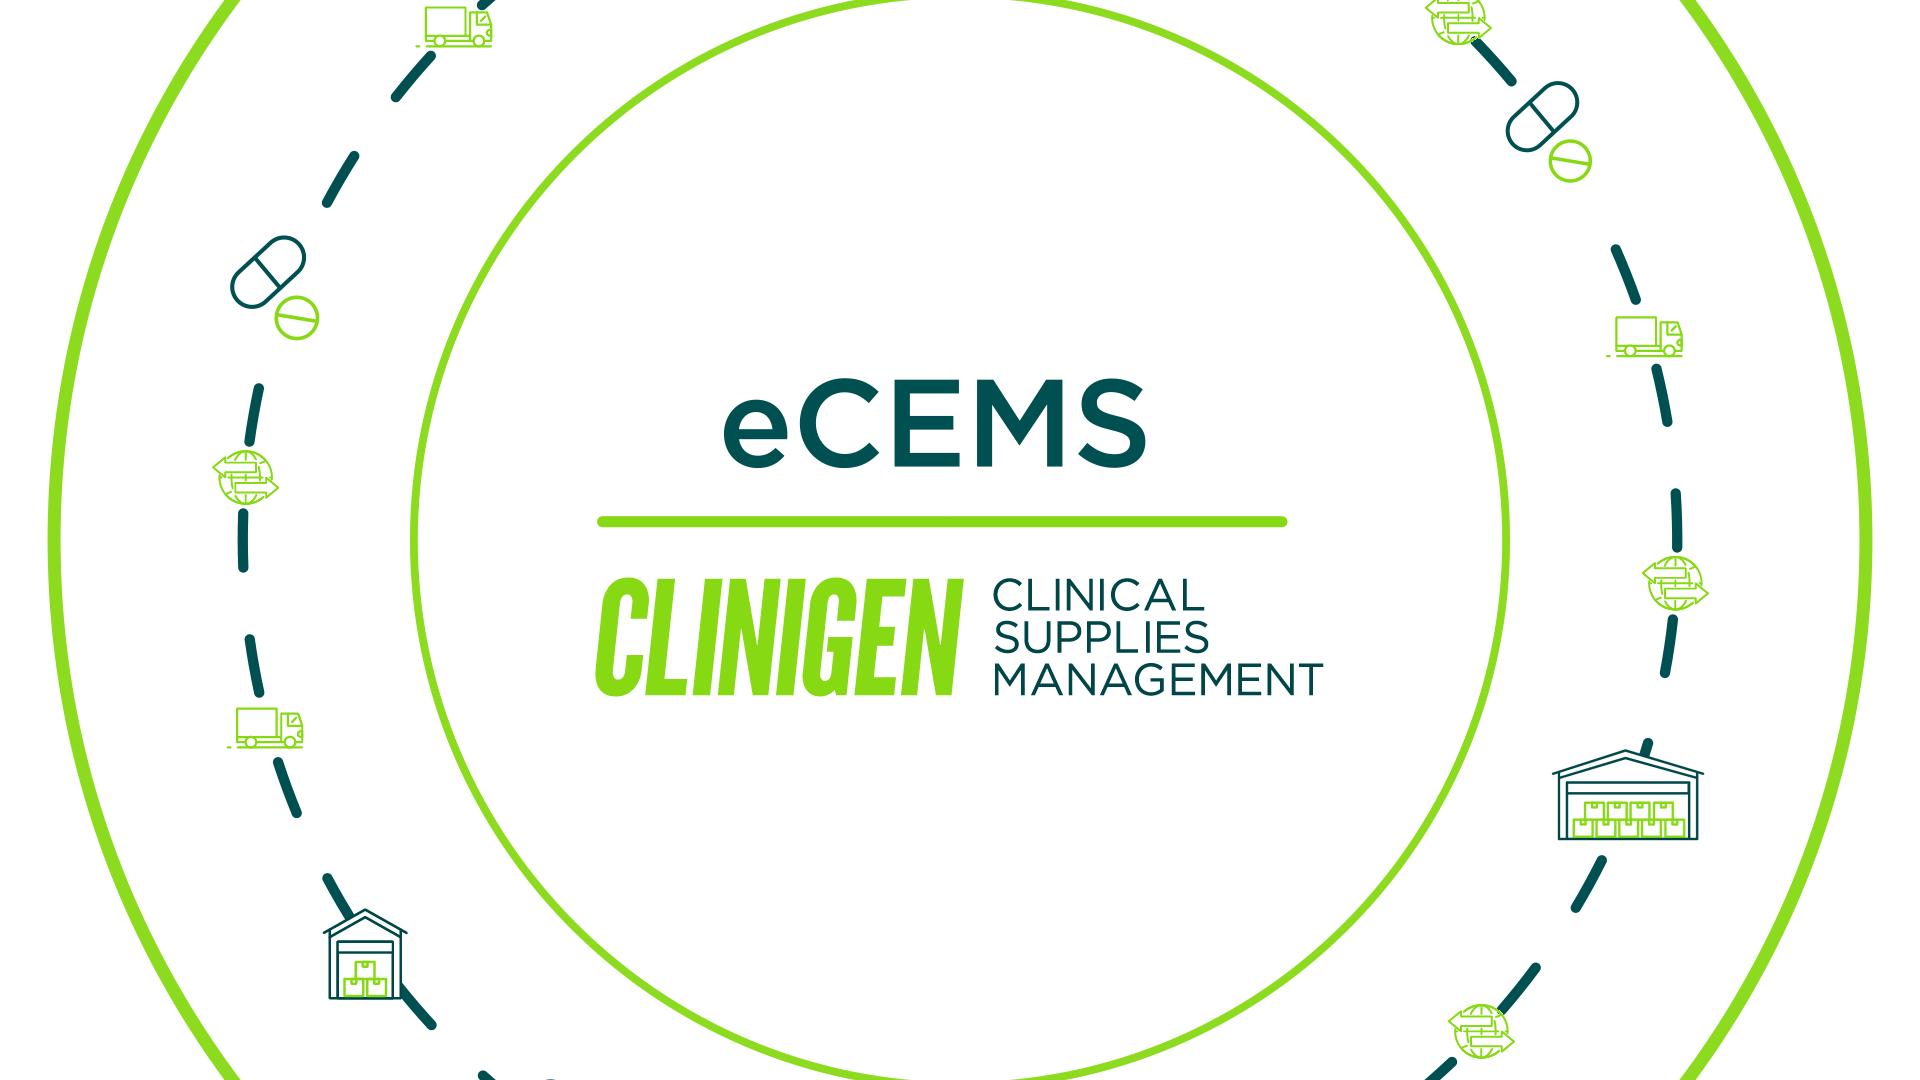 Clinigen eCEM V4 (With Smart eCEMS)